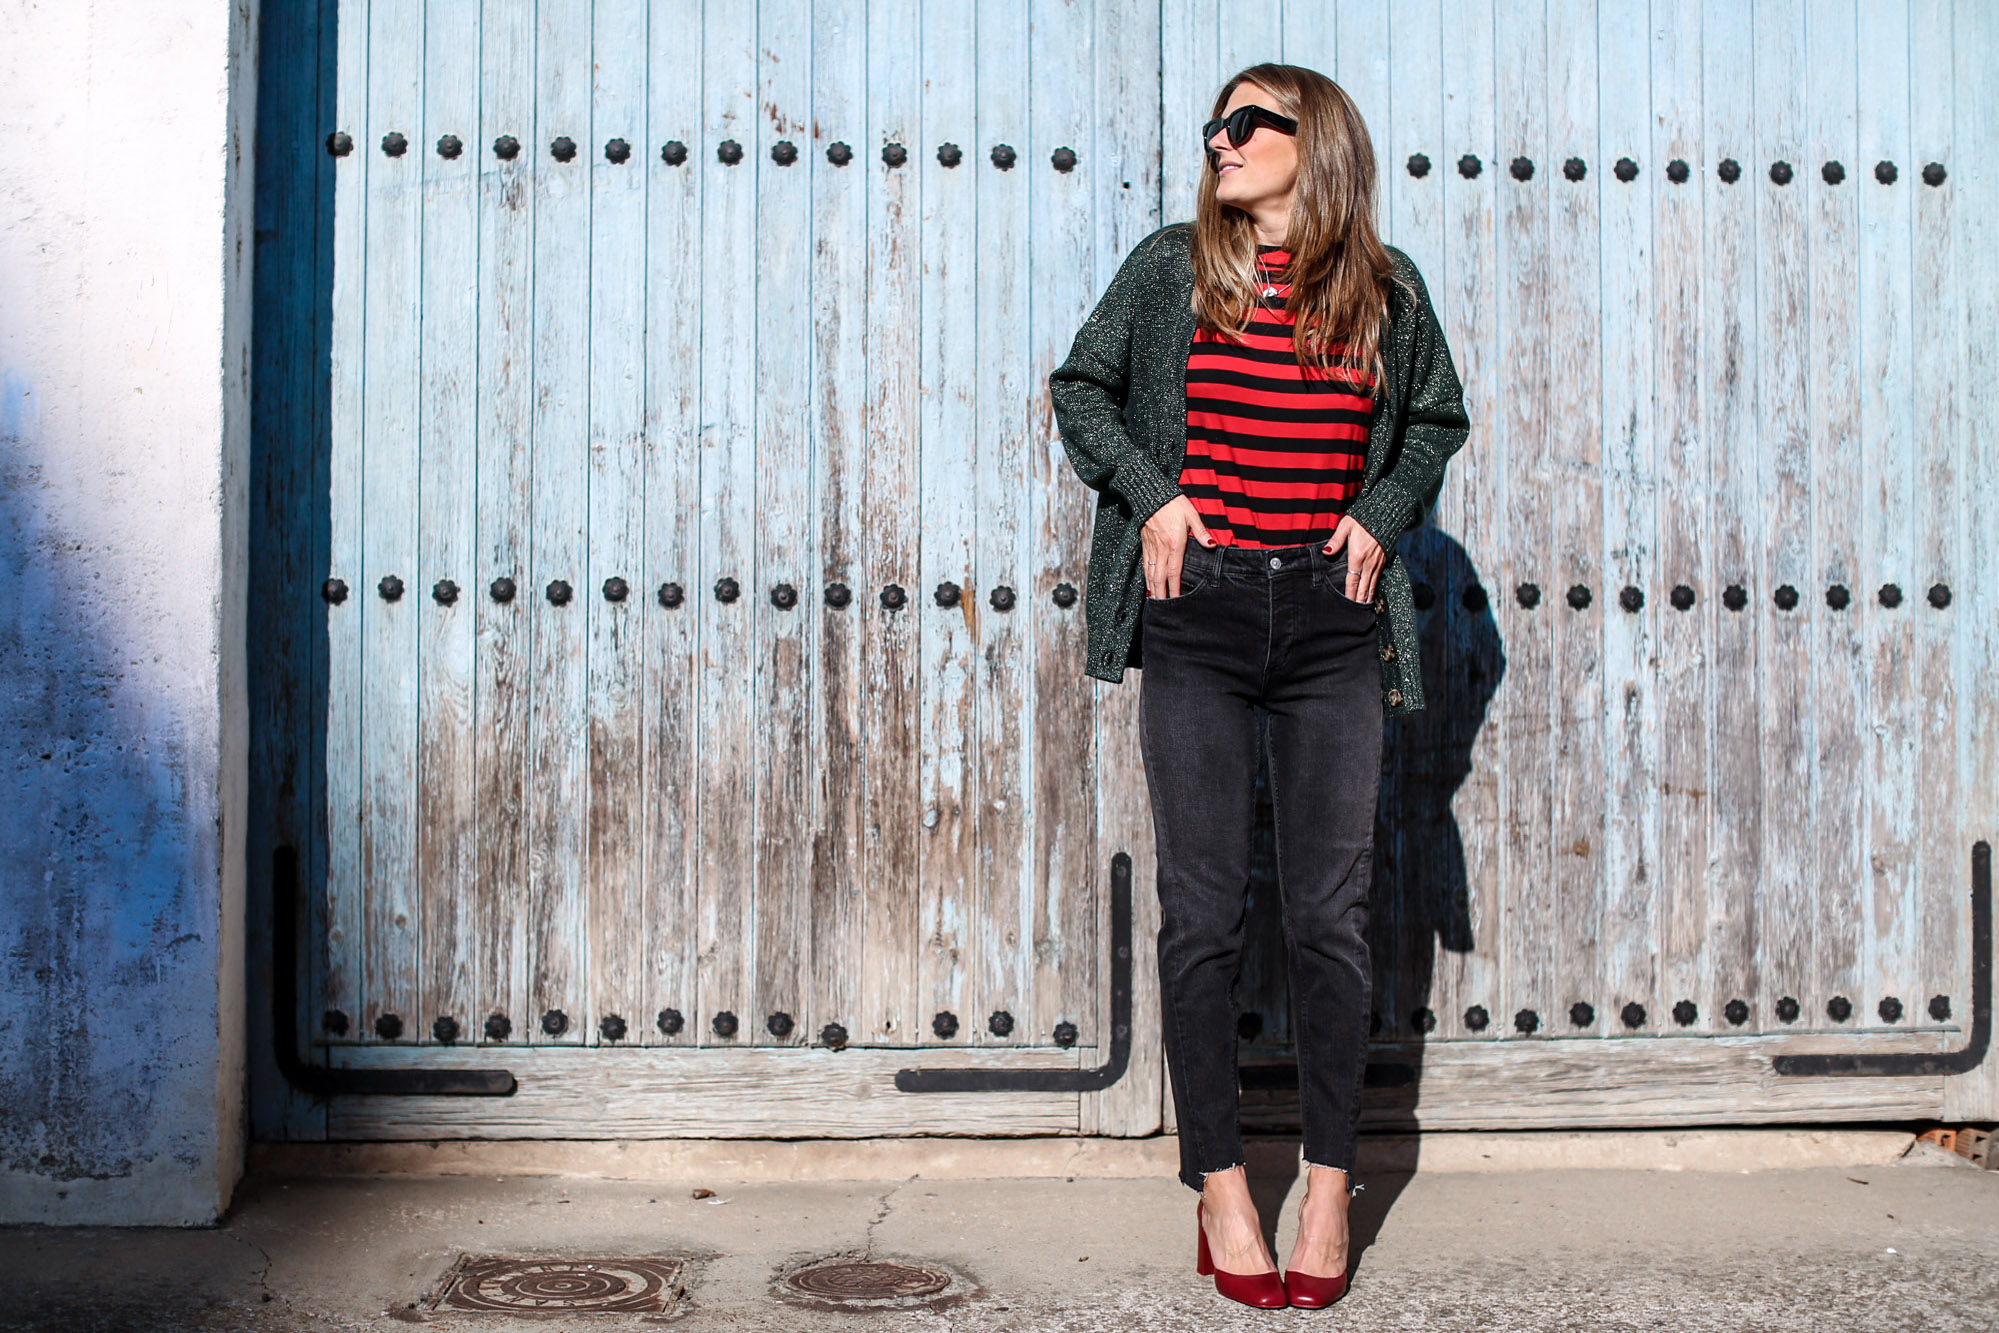 clochet_streetstyle_fashionblogger_zapatostaconrojospielzara_bolsotrioceline_momjeansh&m-6